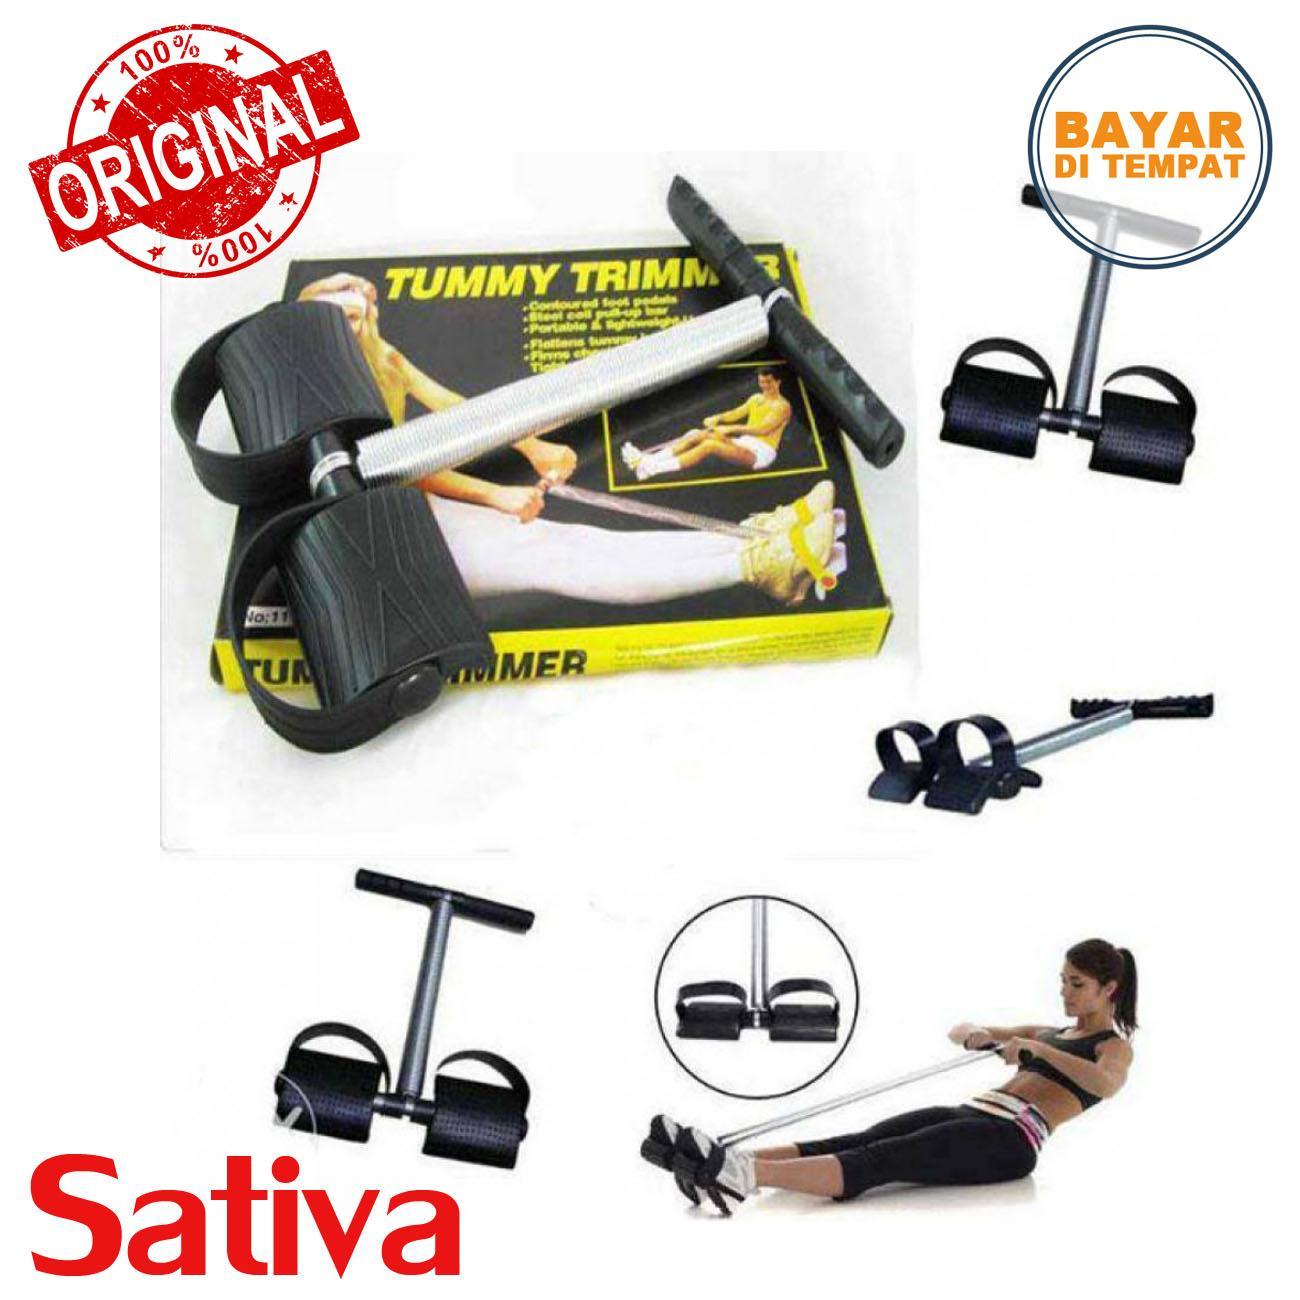 Alat Olah Raga / Alat Fitnes / Tummy Trimmer / Sit Up Gym By Sativa Perkakas Alat Dan Audio.